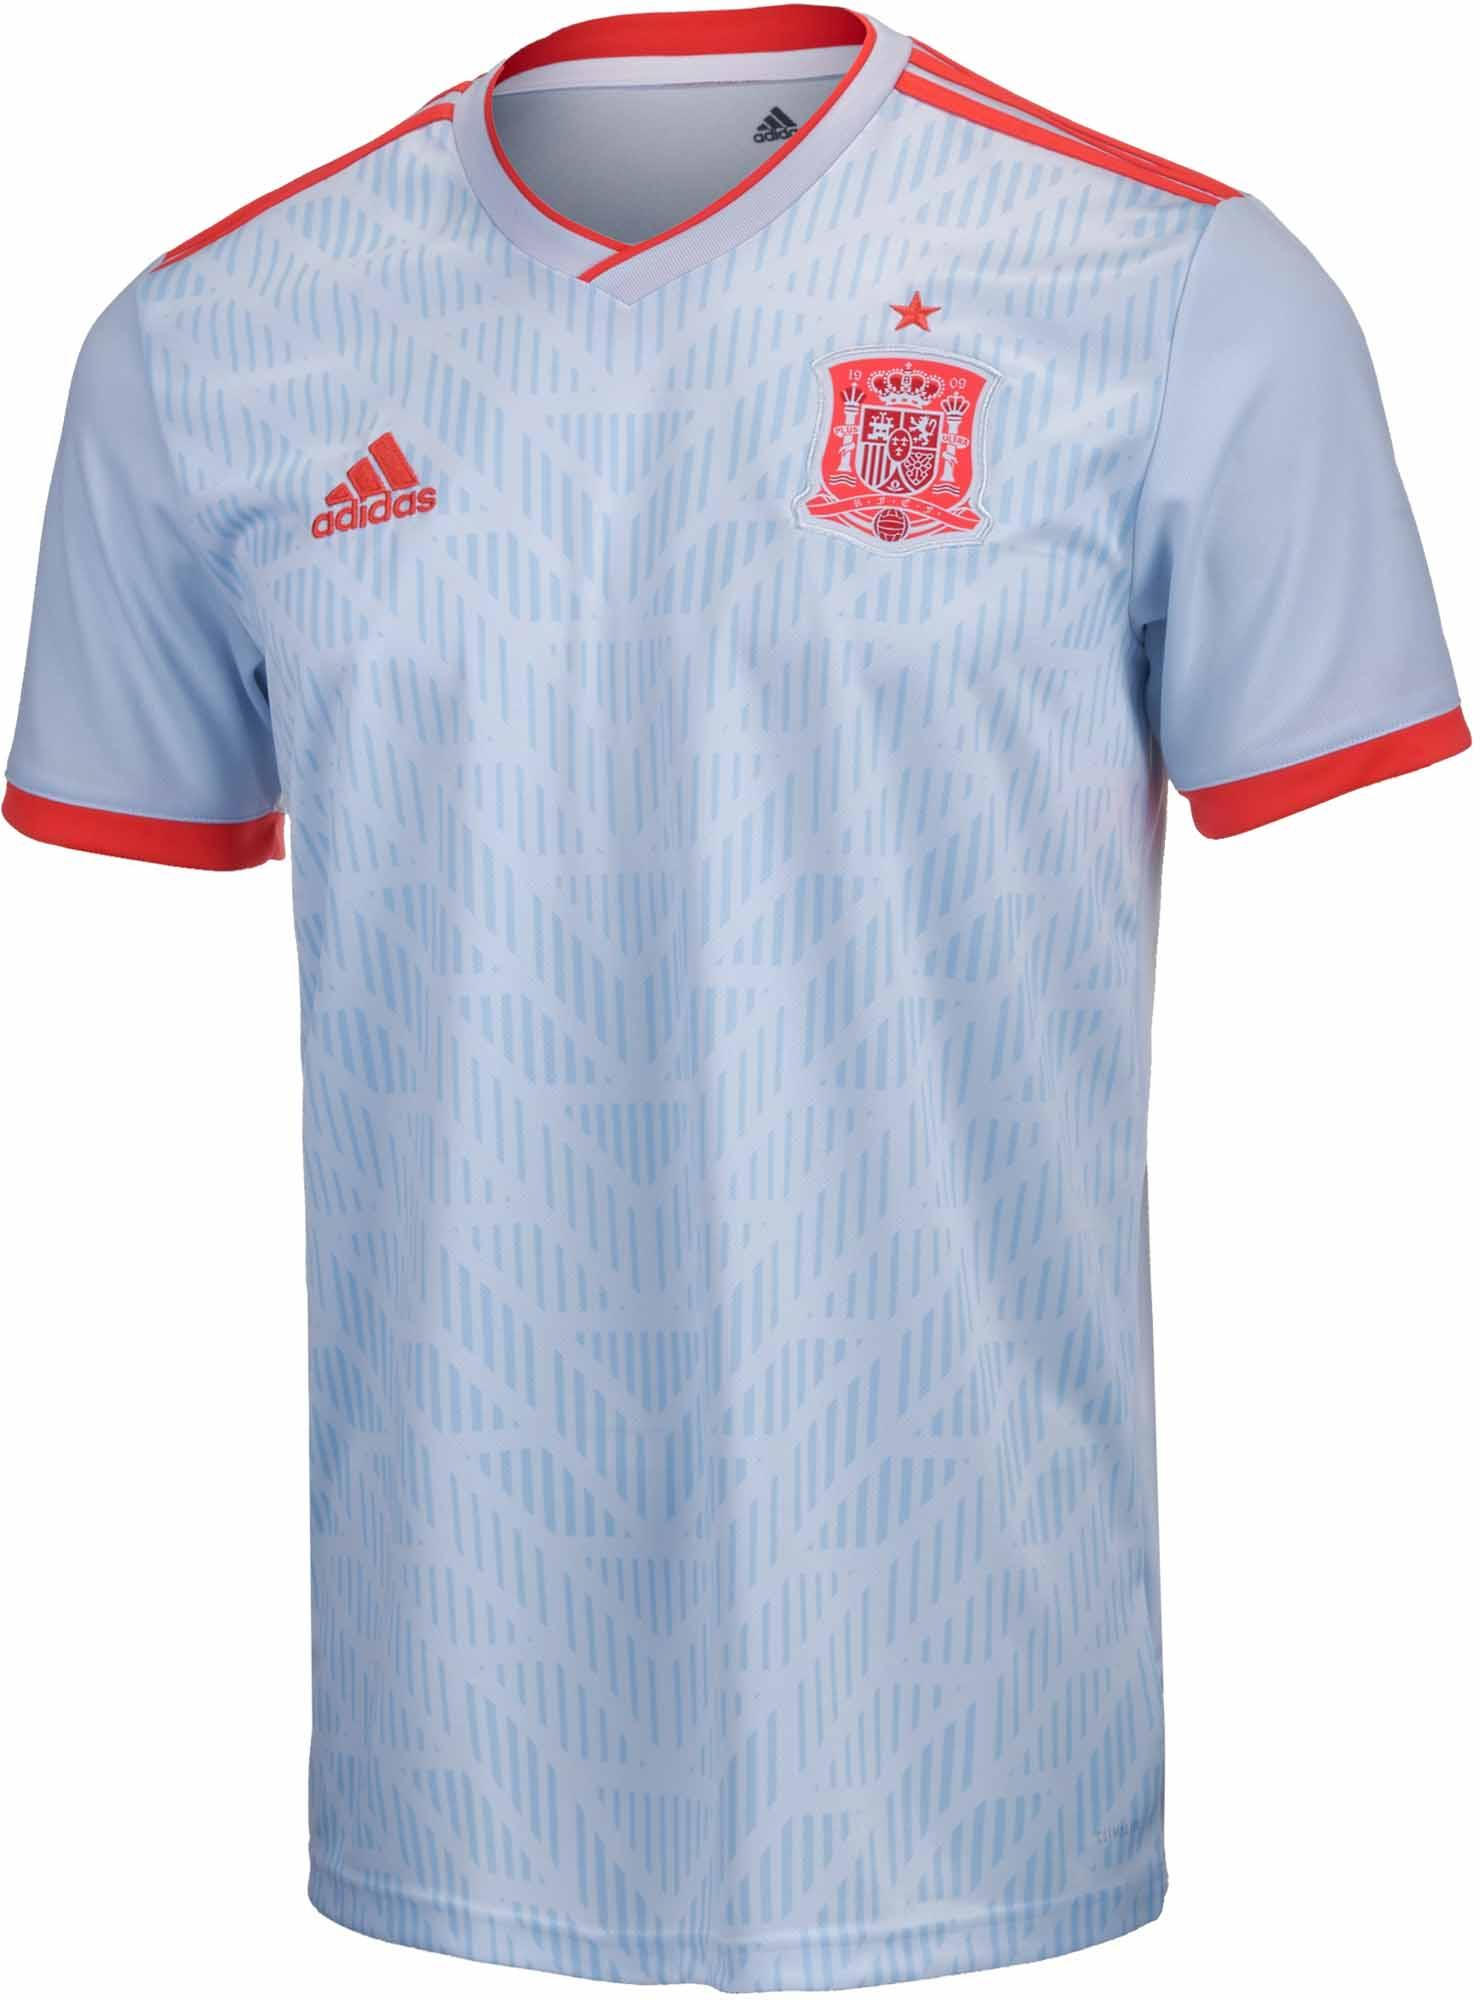 6adee471e5bd3 adidas Kids Spain Away Jersey 2018-19 - SoccerPro.com